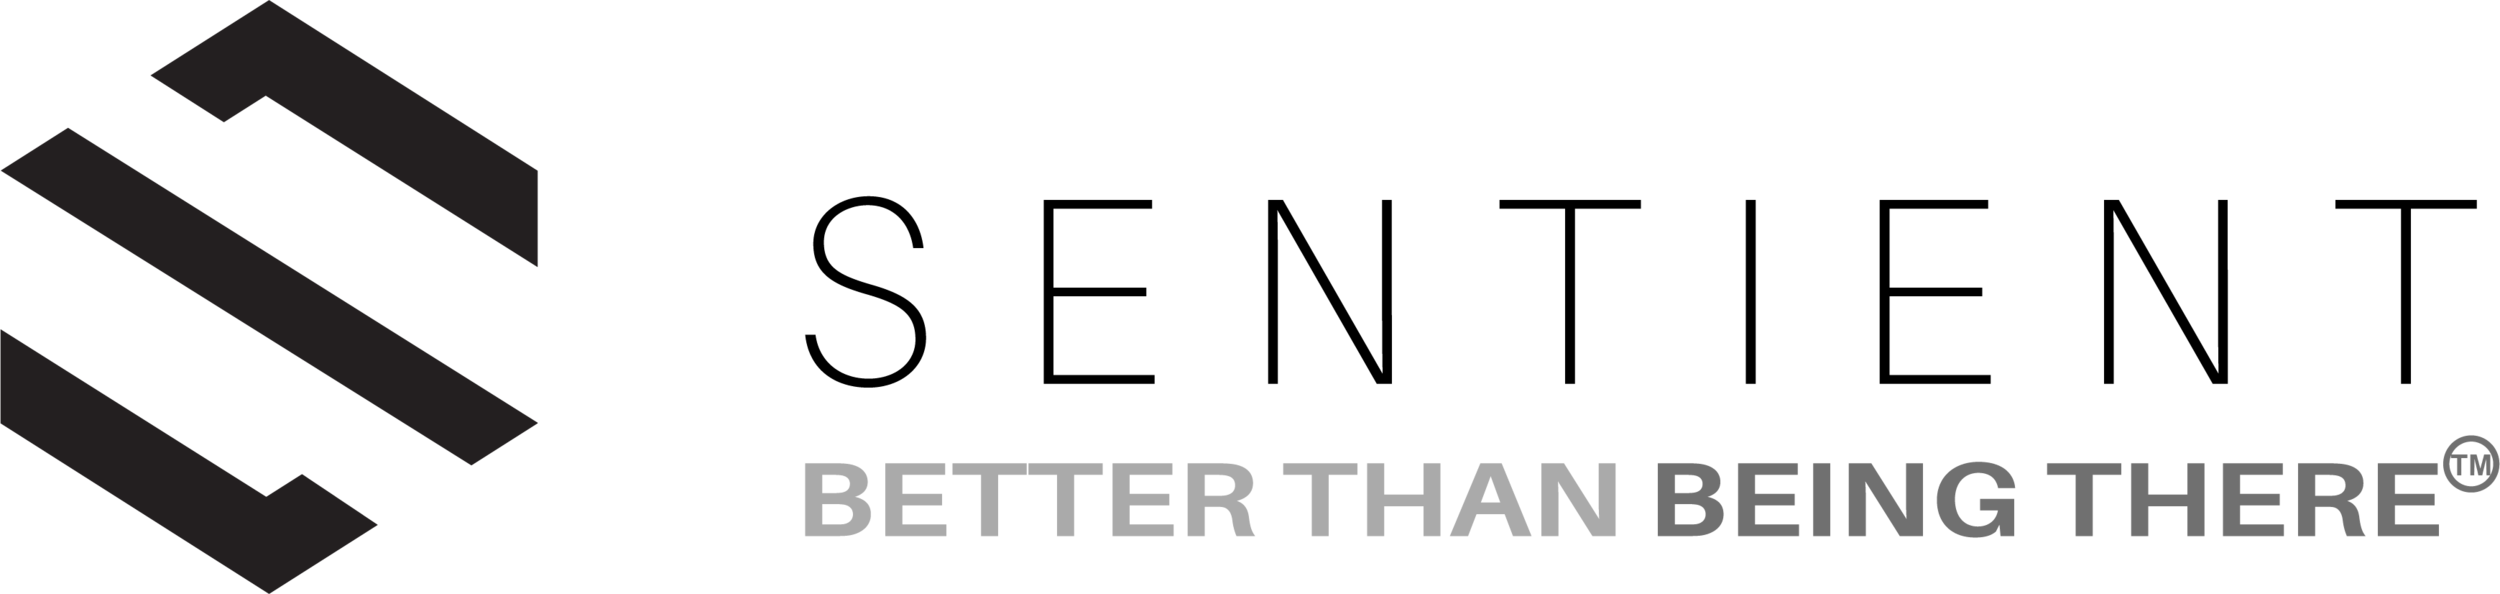 Sentient-Logo-Black-Vector-2.png